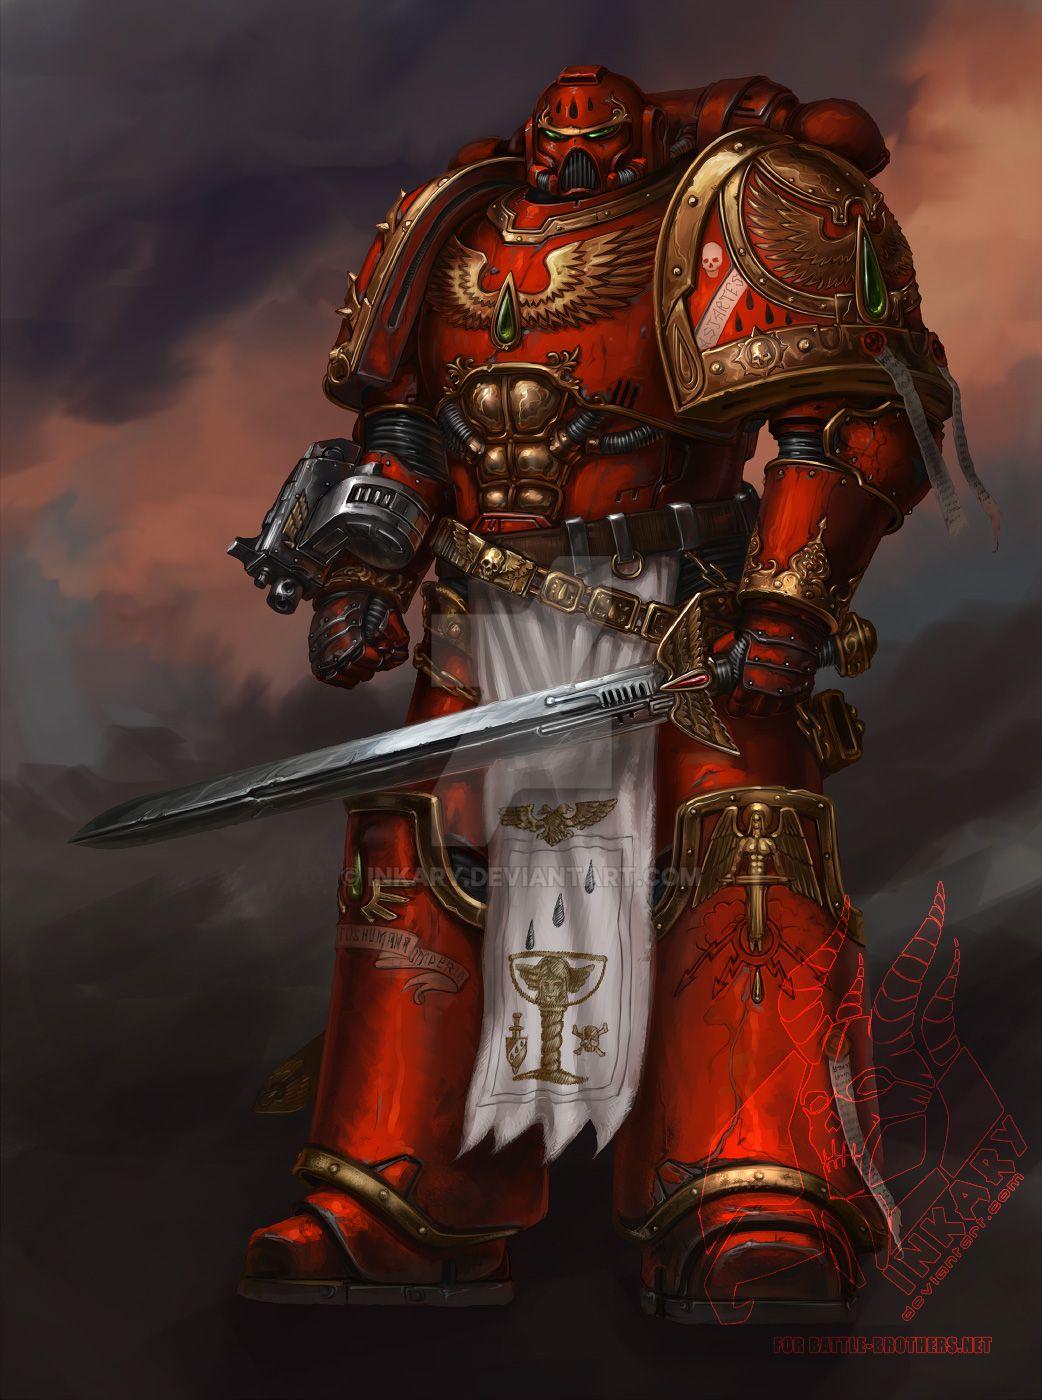 Warhammer 40k death company wallpaper - Diegogisbertllorens 718 16 Ventarael Of Blood Angels By Inkary